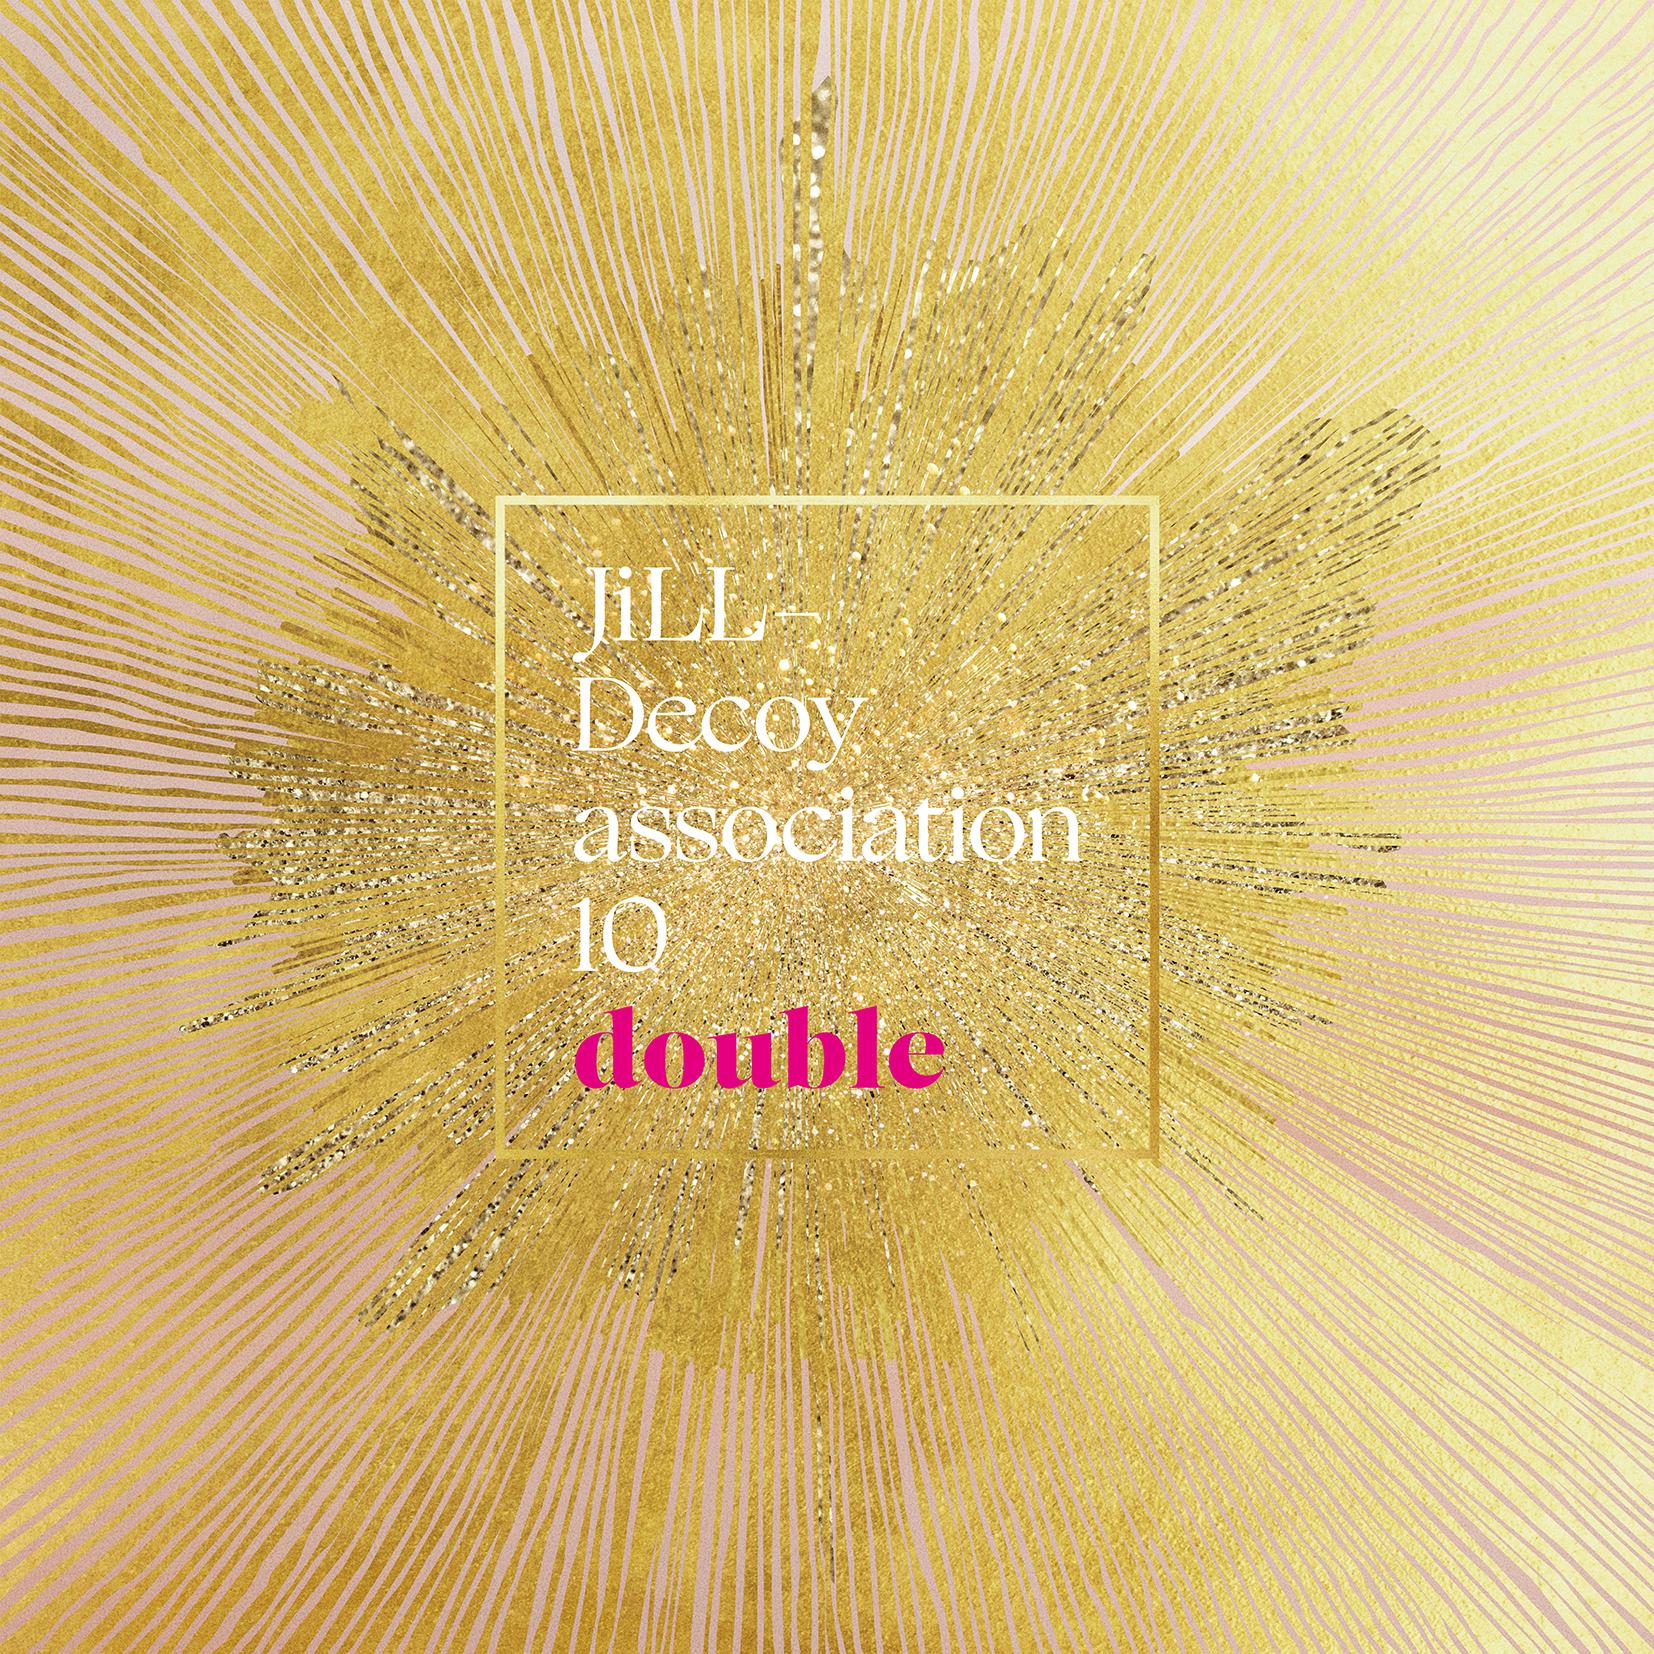 JiLL-Decoy association 「10 ~double~」